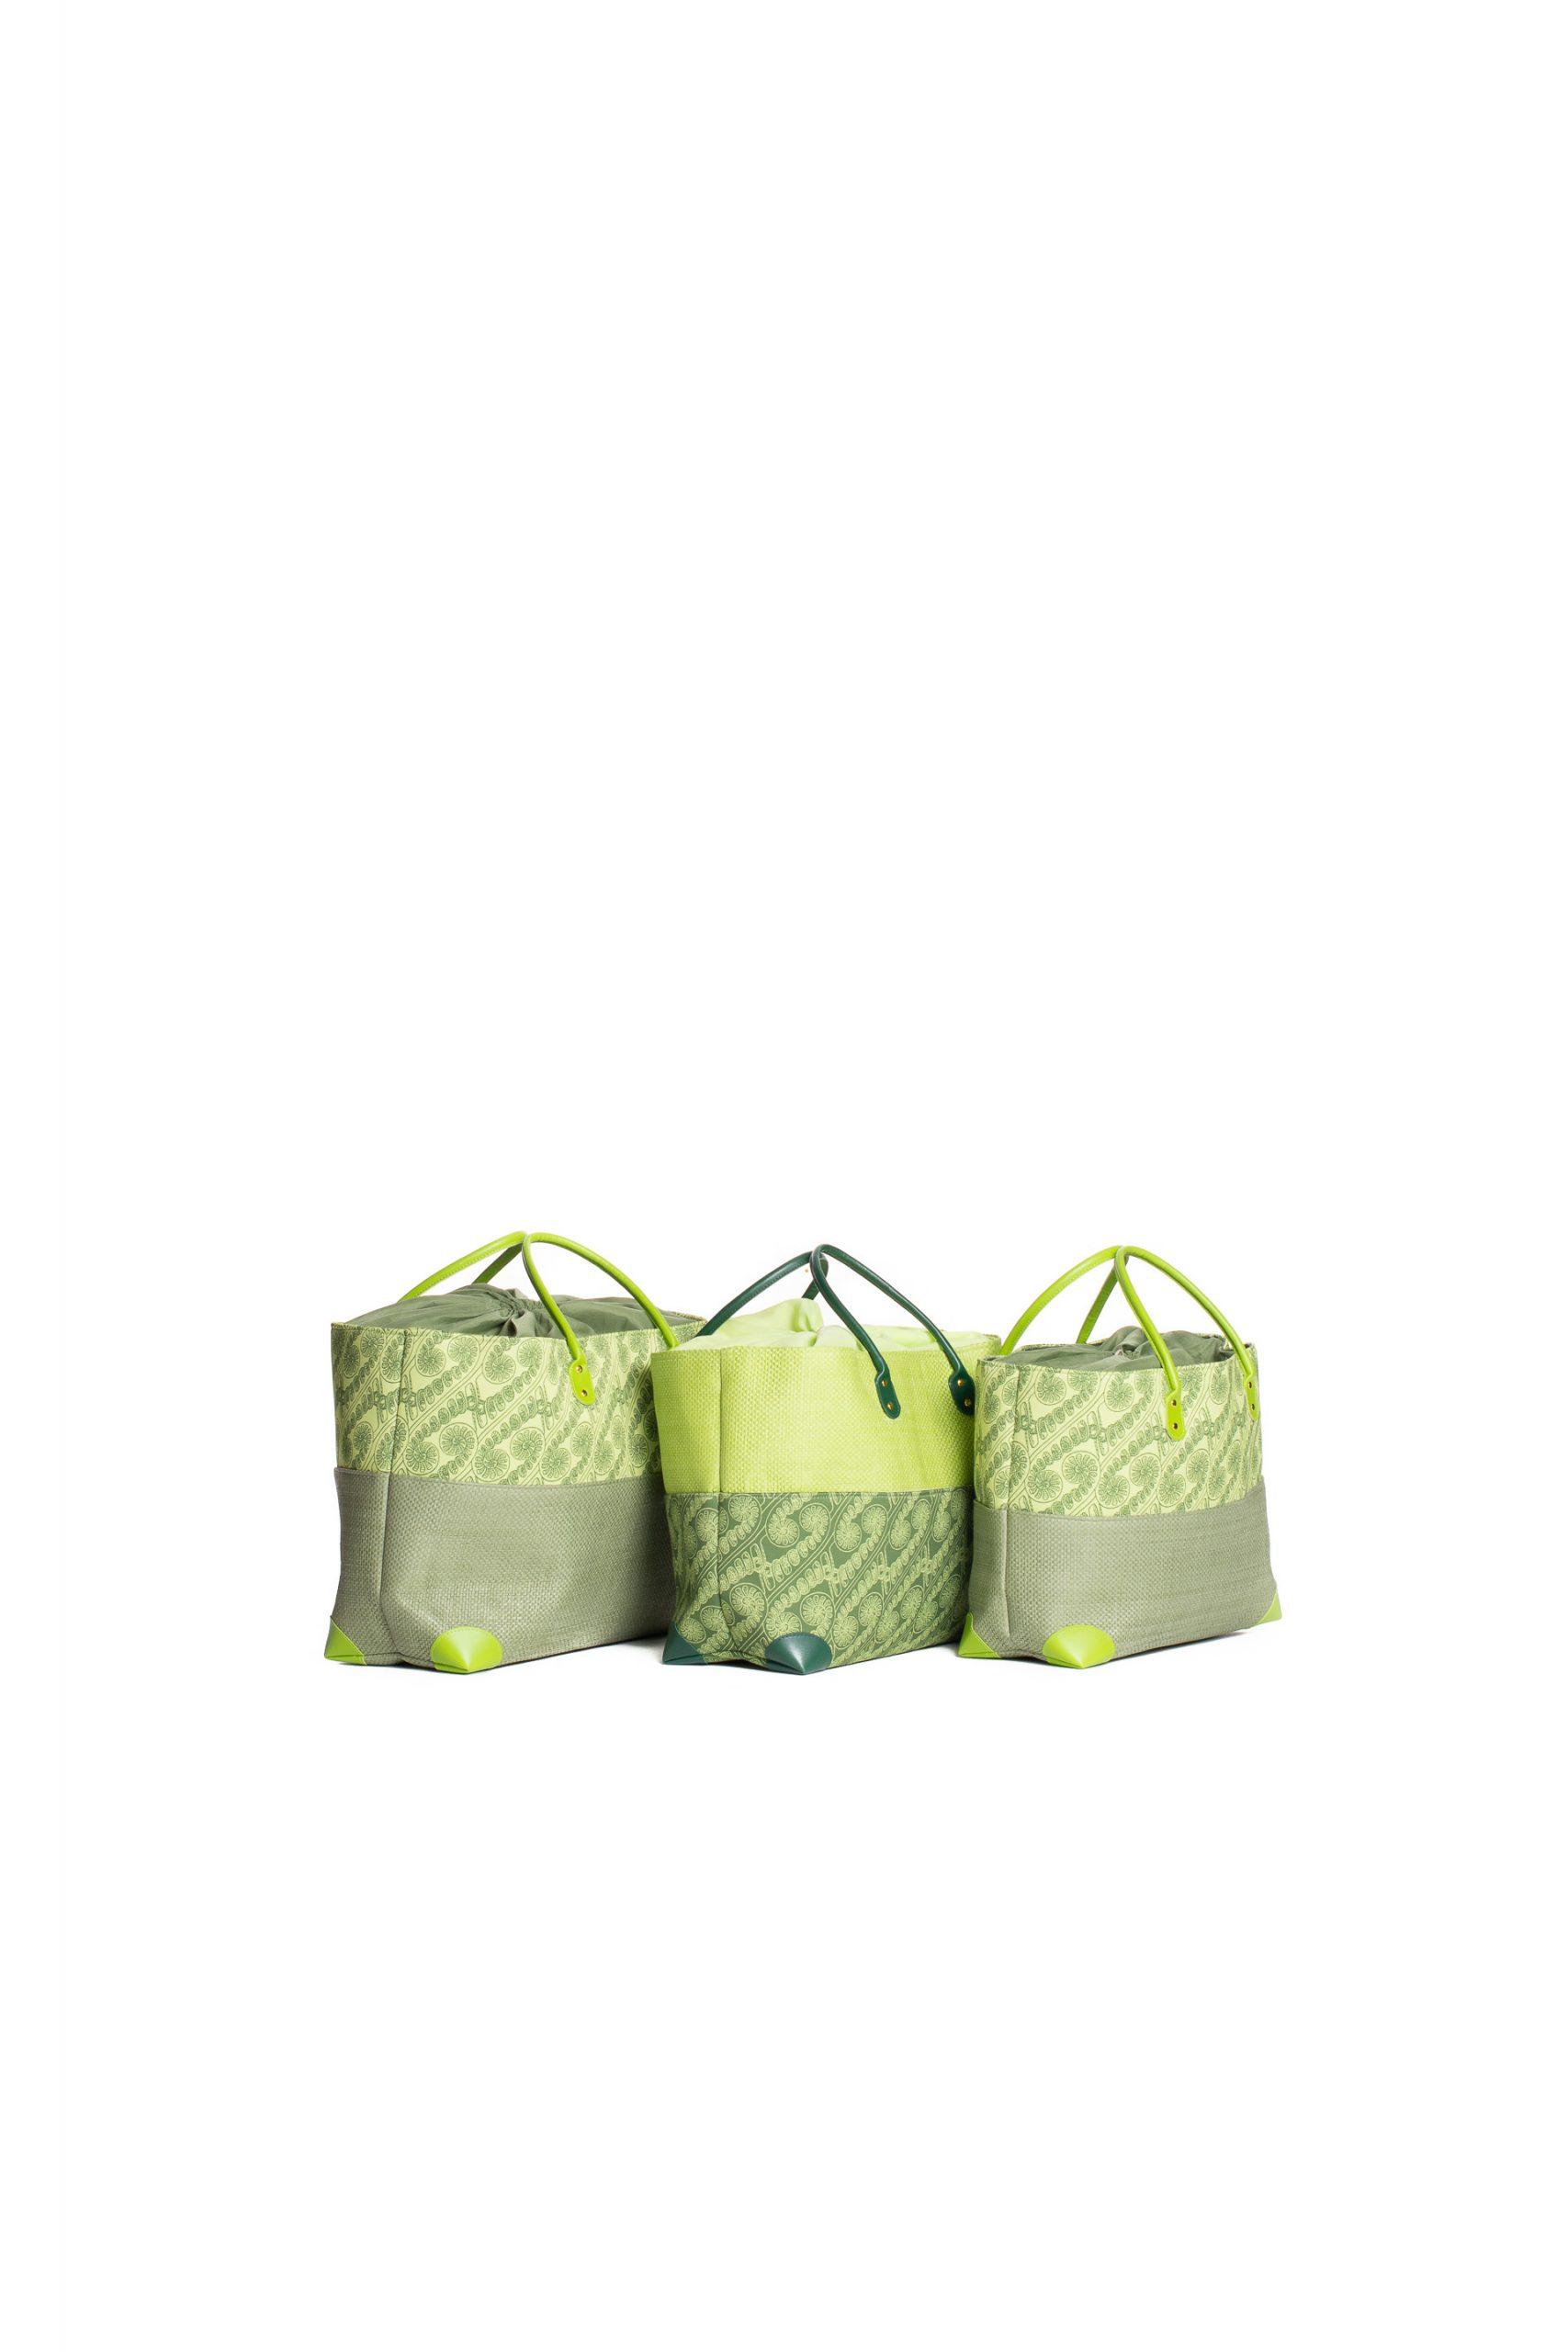 Hula Trio Bag Set in Green